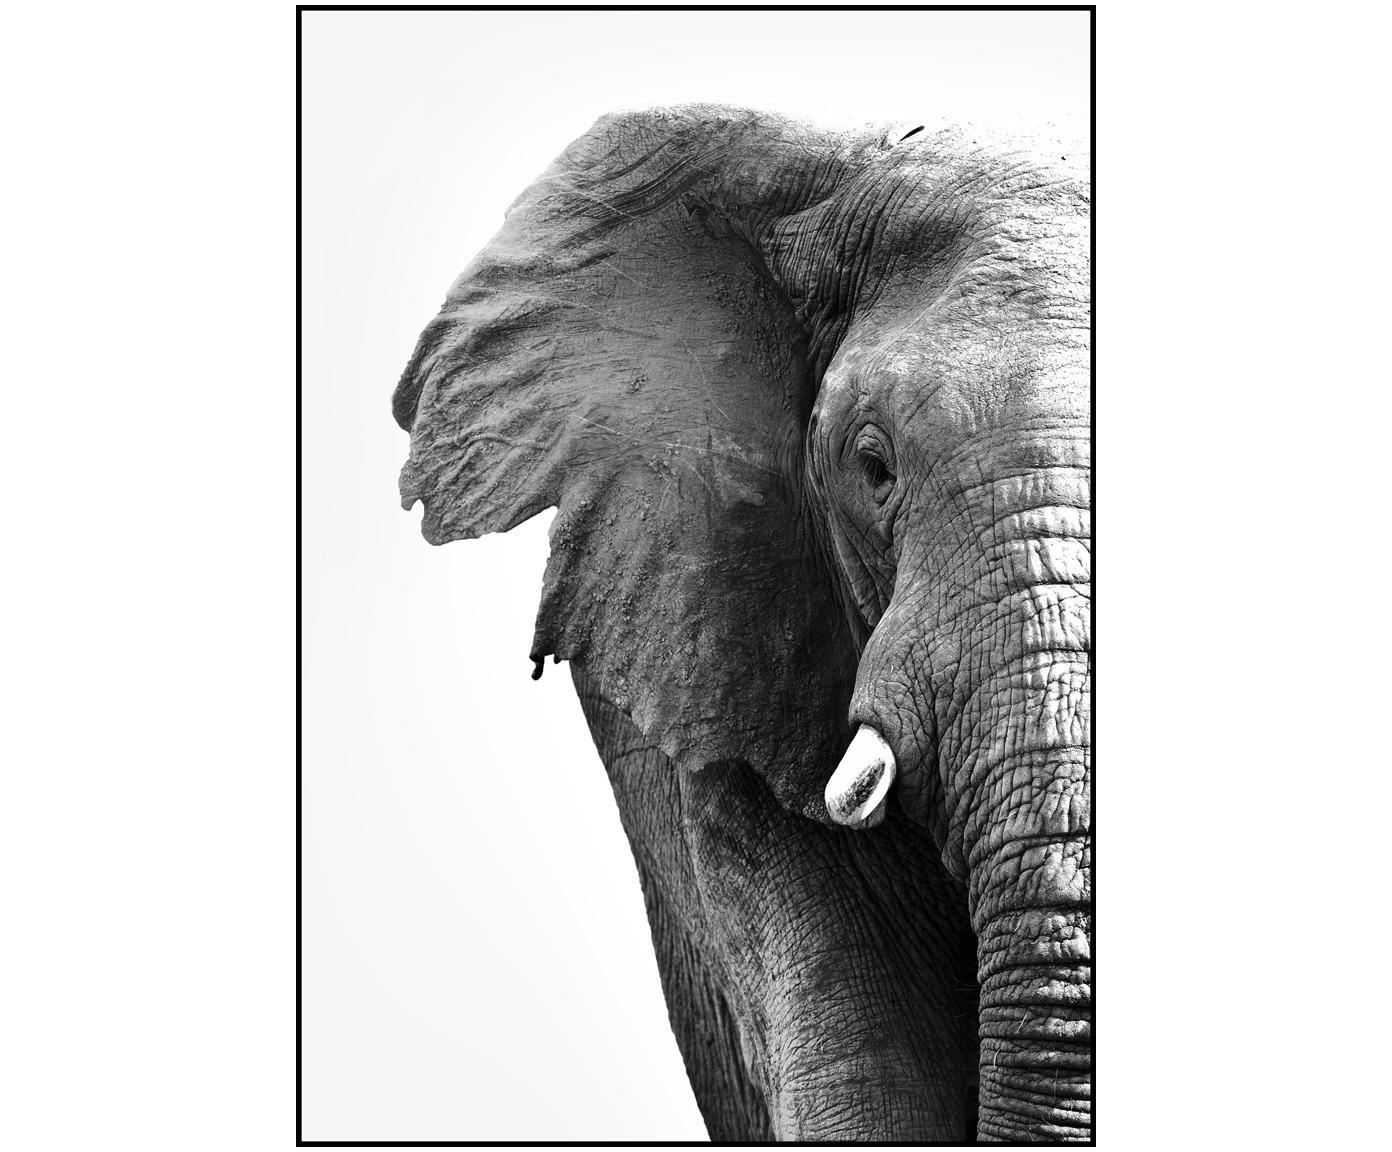 Impresión digital enmarcada White Elephant, Fotografía: impresión digital sobre p, Parte trasera: tablero de fibras de dens, Negro, blanco, An 30 x Al 40 cm